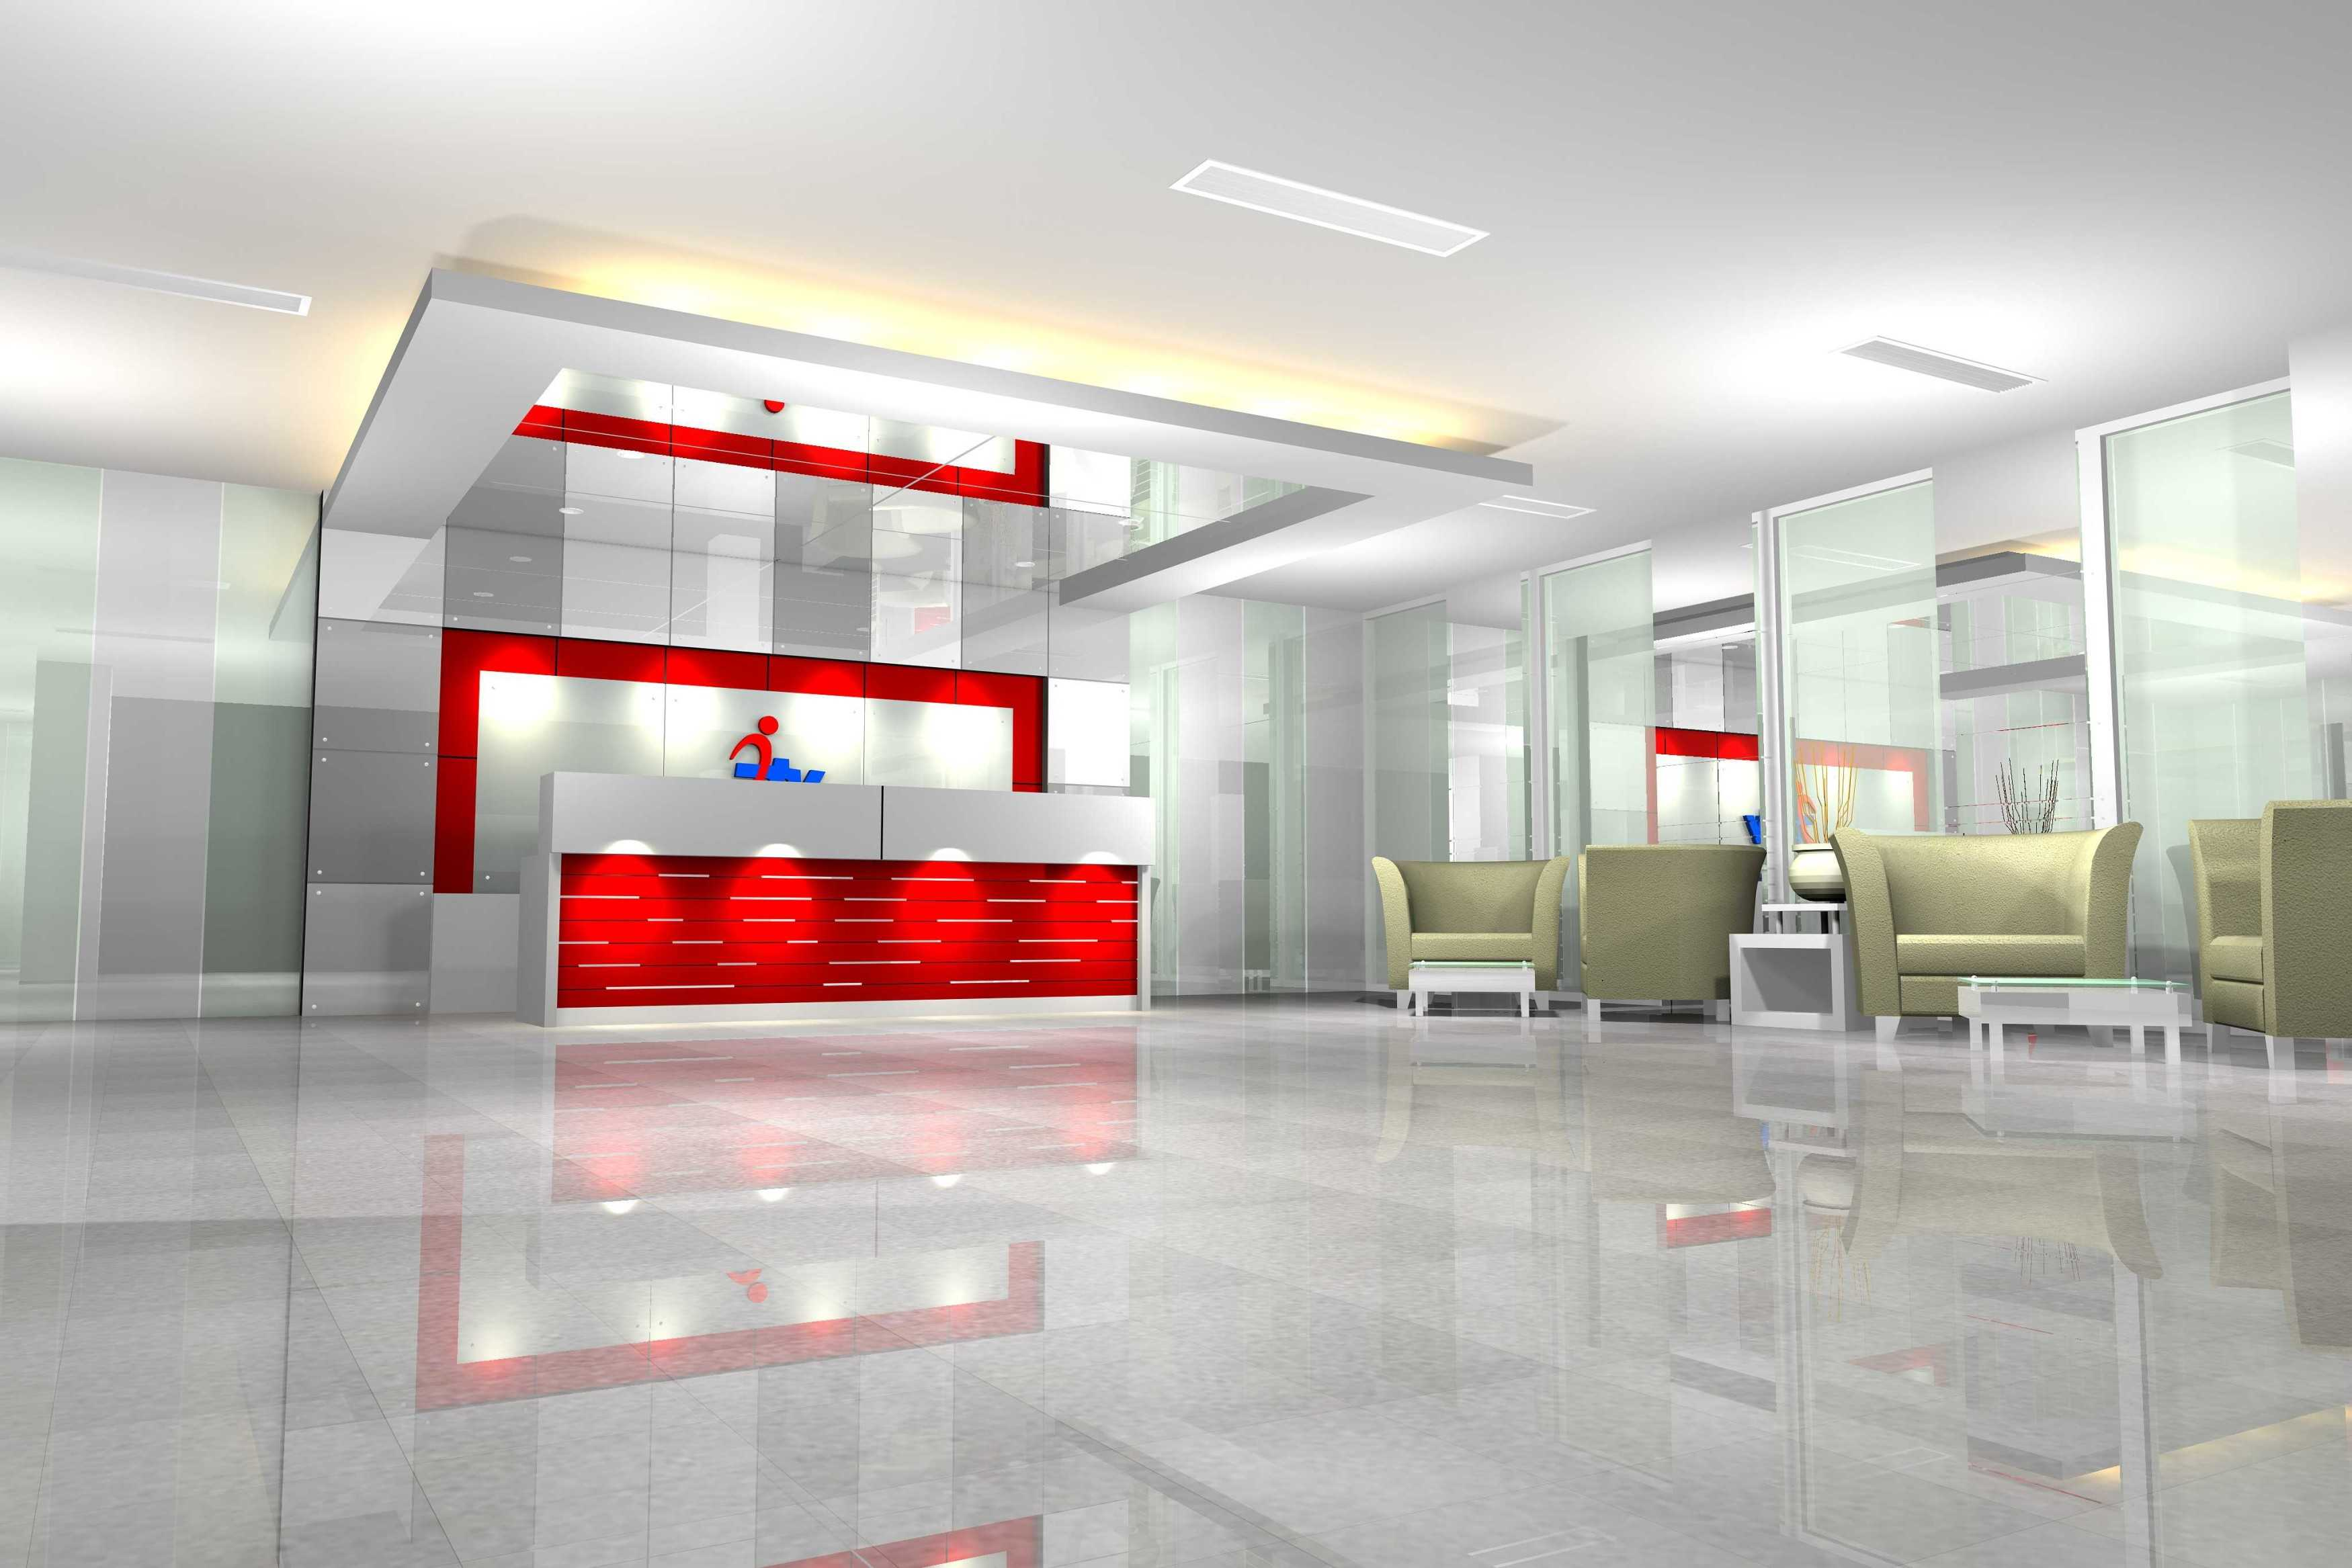 Ega Cipta Pratama Jtv Interior Surabaya Surabaya, Kota Sby, Jawa Timur, Indonesia Surabaya, Kota Sby, Jawa Timur, Indonesia Ega-Cipta-Pratama-Jtv-Interior-Surabaya Minimalis  55470